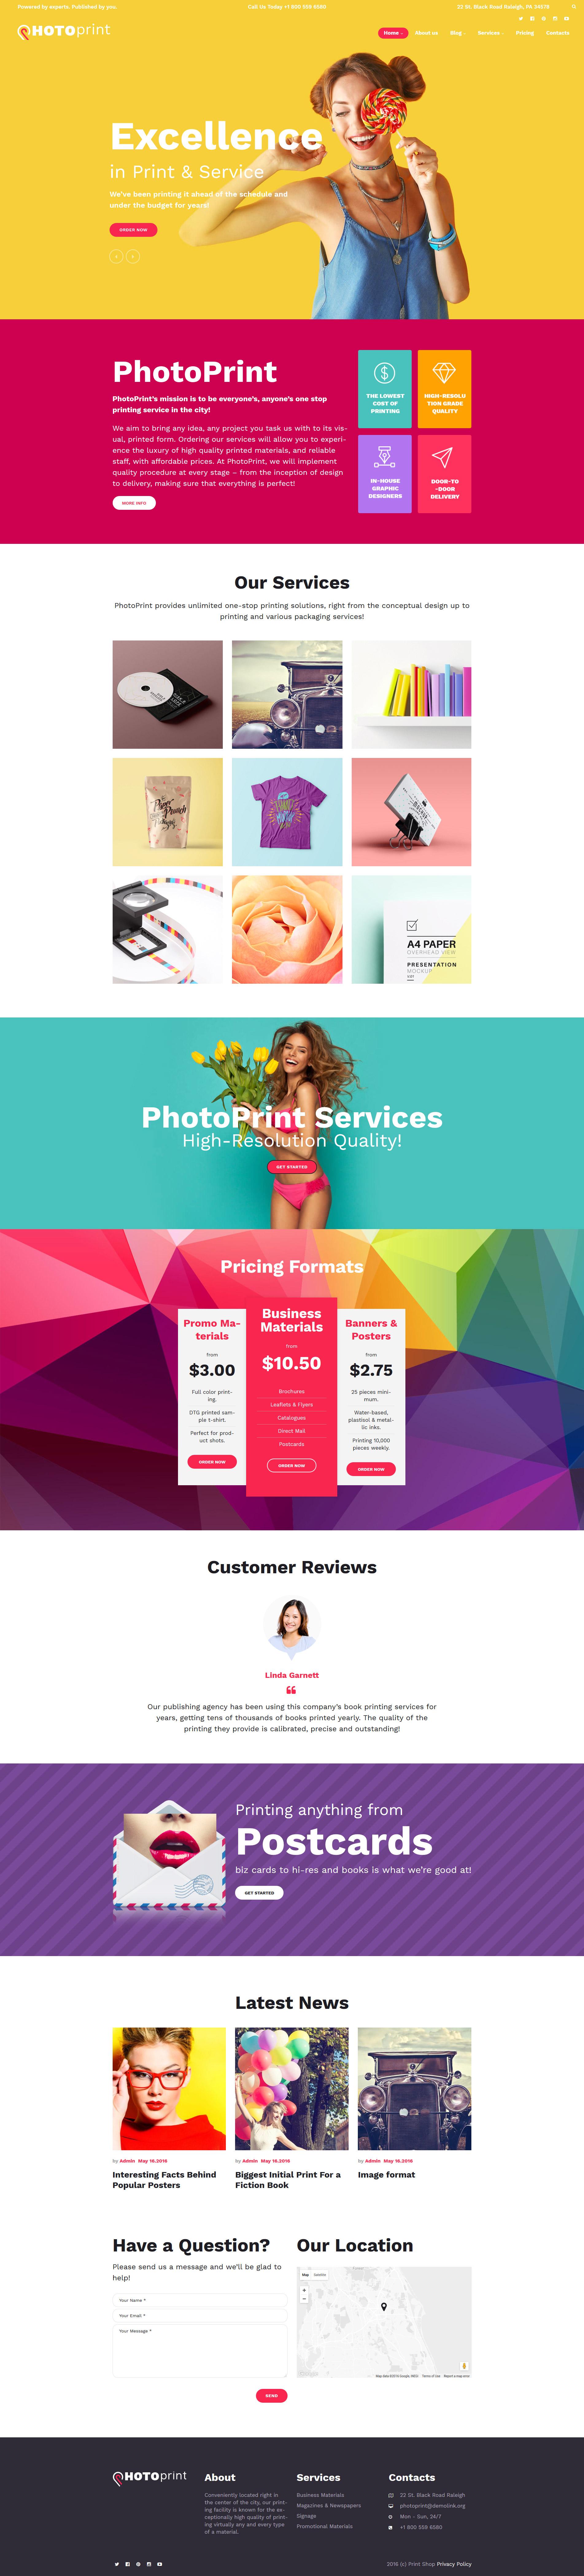 """PhotoPrint - Print Shop Responsive"" - адаптивний WordPress шаблон №60122"